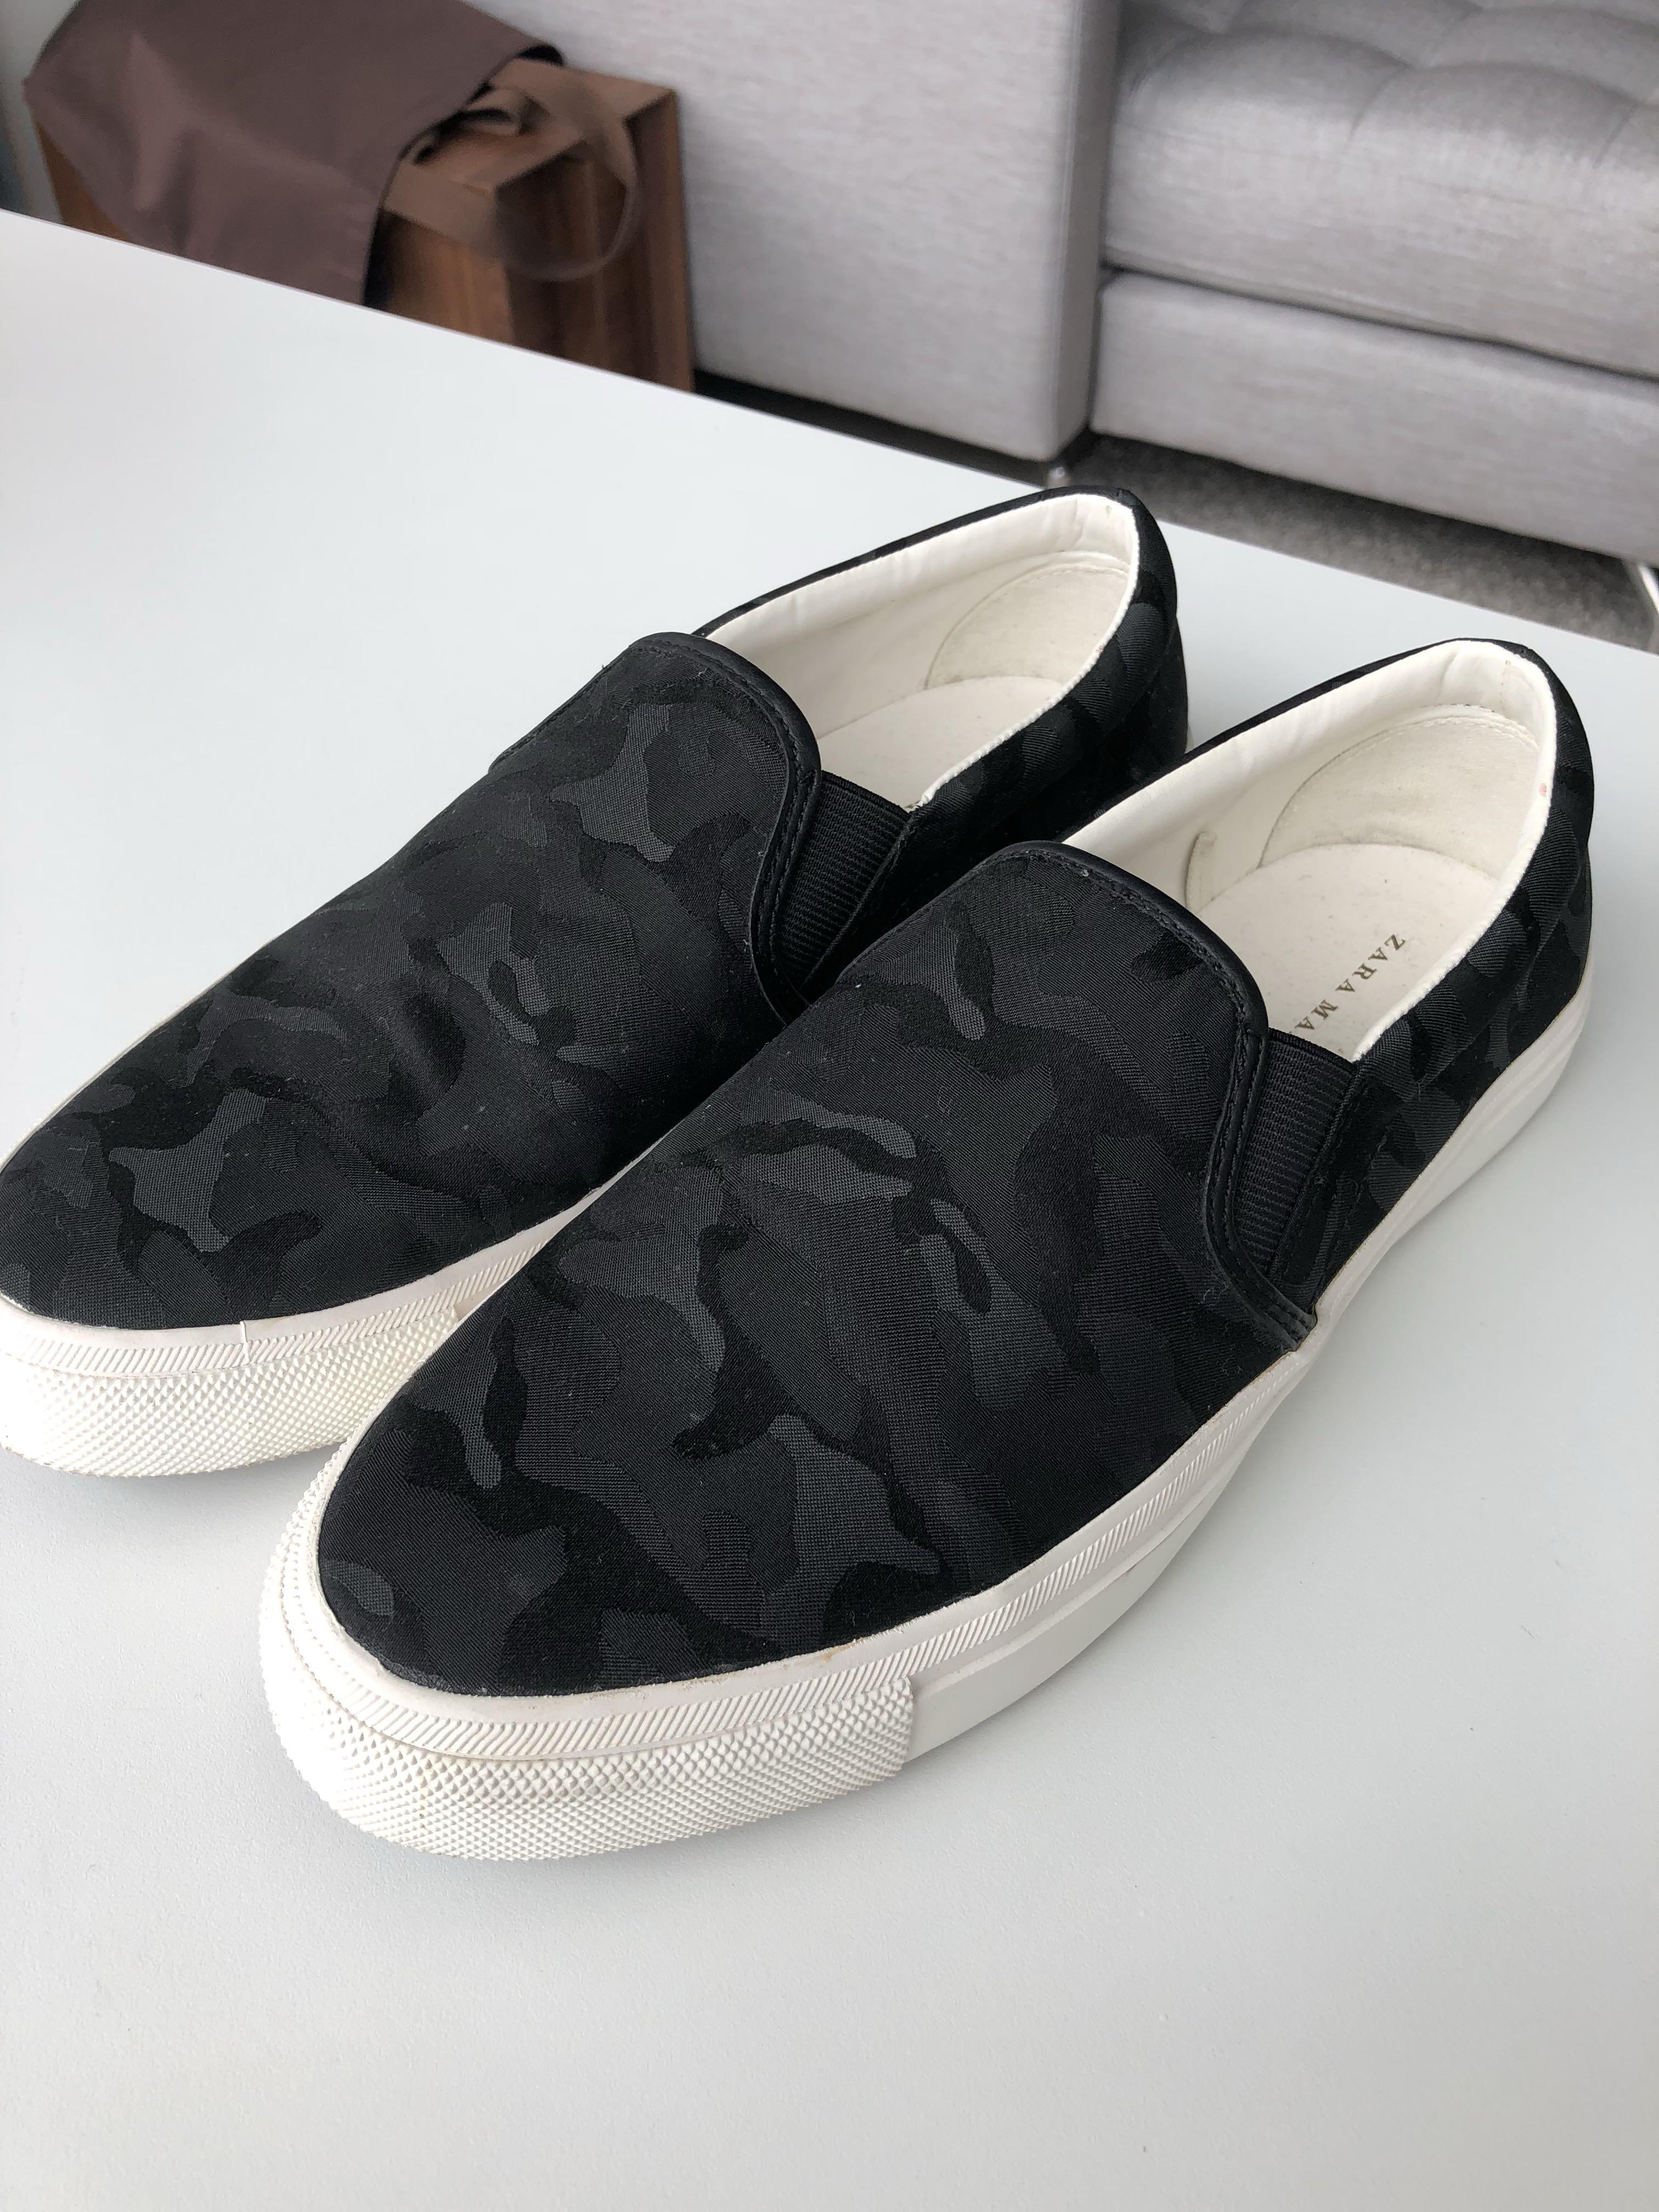 b42380df Zara Man Casual Shoe, Men's Fashion, Footwear, Slippers & Sandals on  Carousell